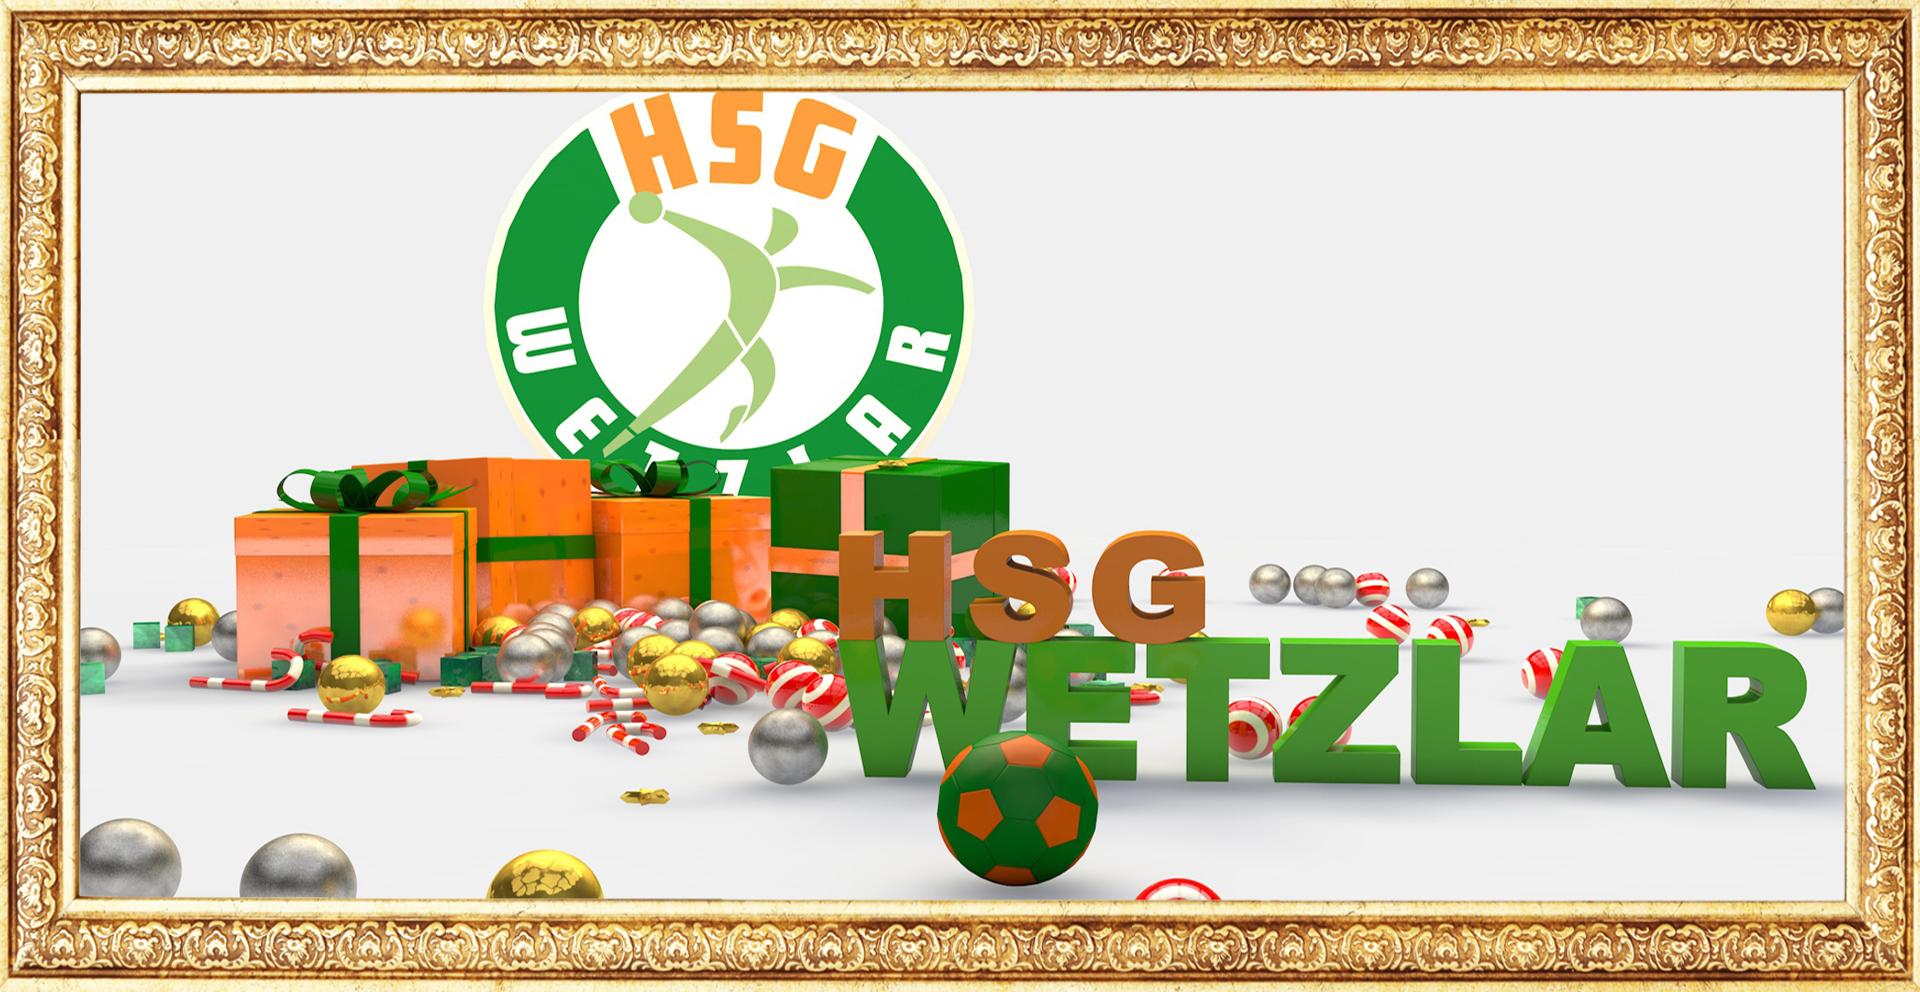 HSG Kalender Rahmen - MEDIA TOOLS